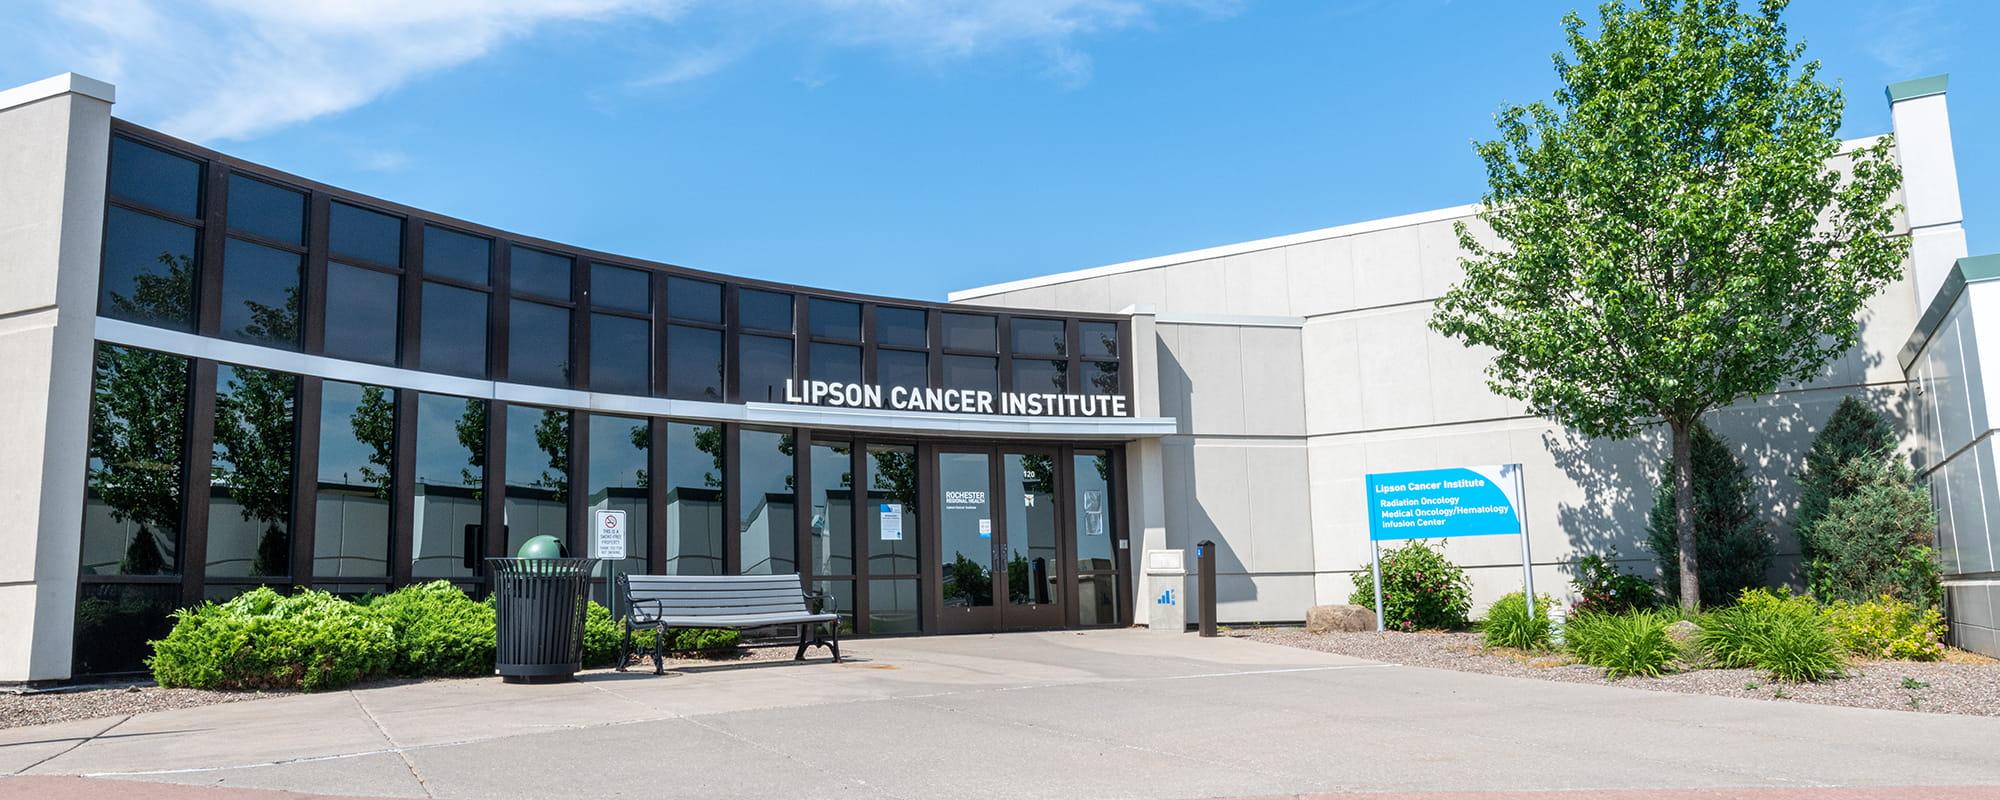 Lipson Cancer Institute - Unity Hospital